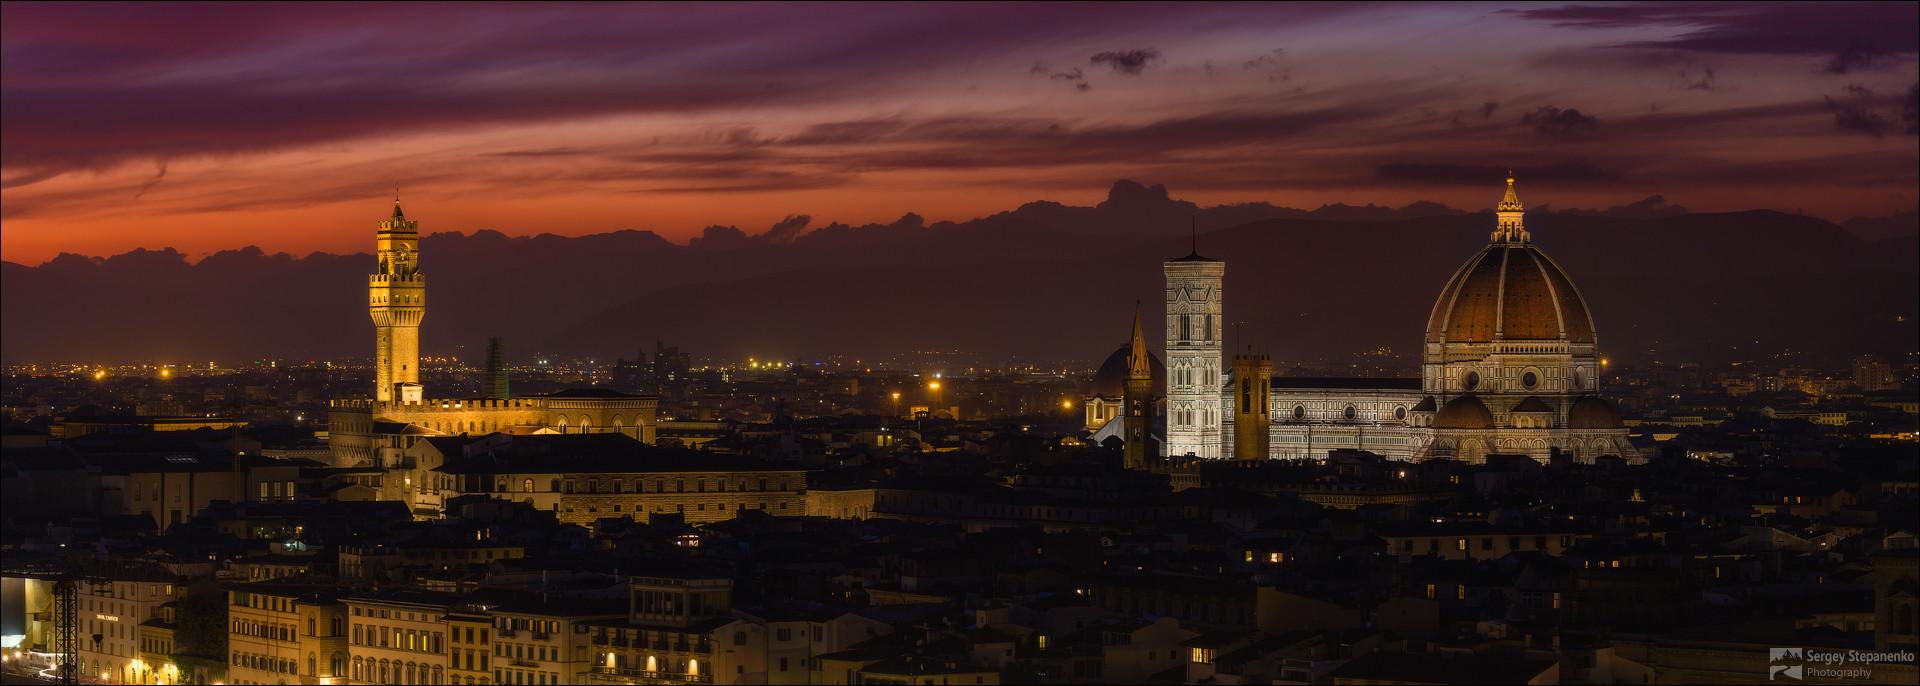 Вечер во Флоренции.jpg